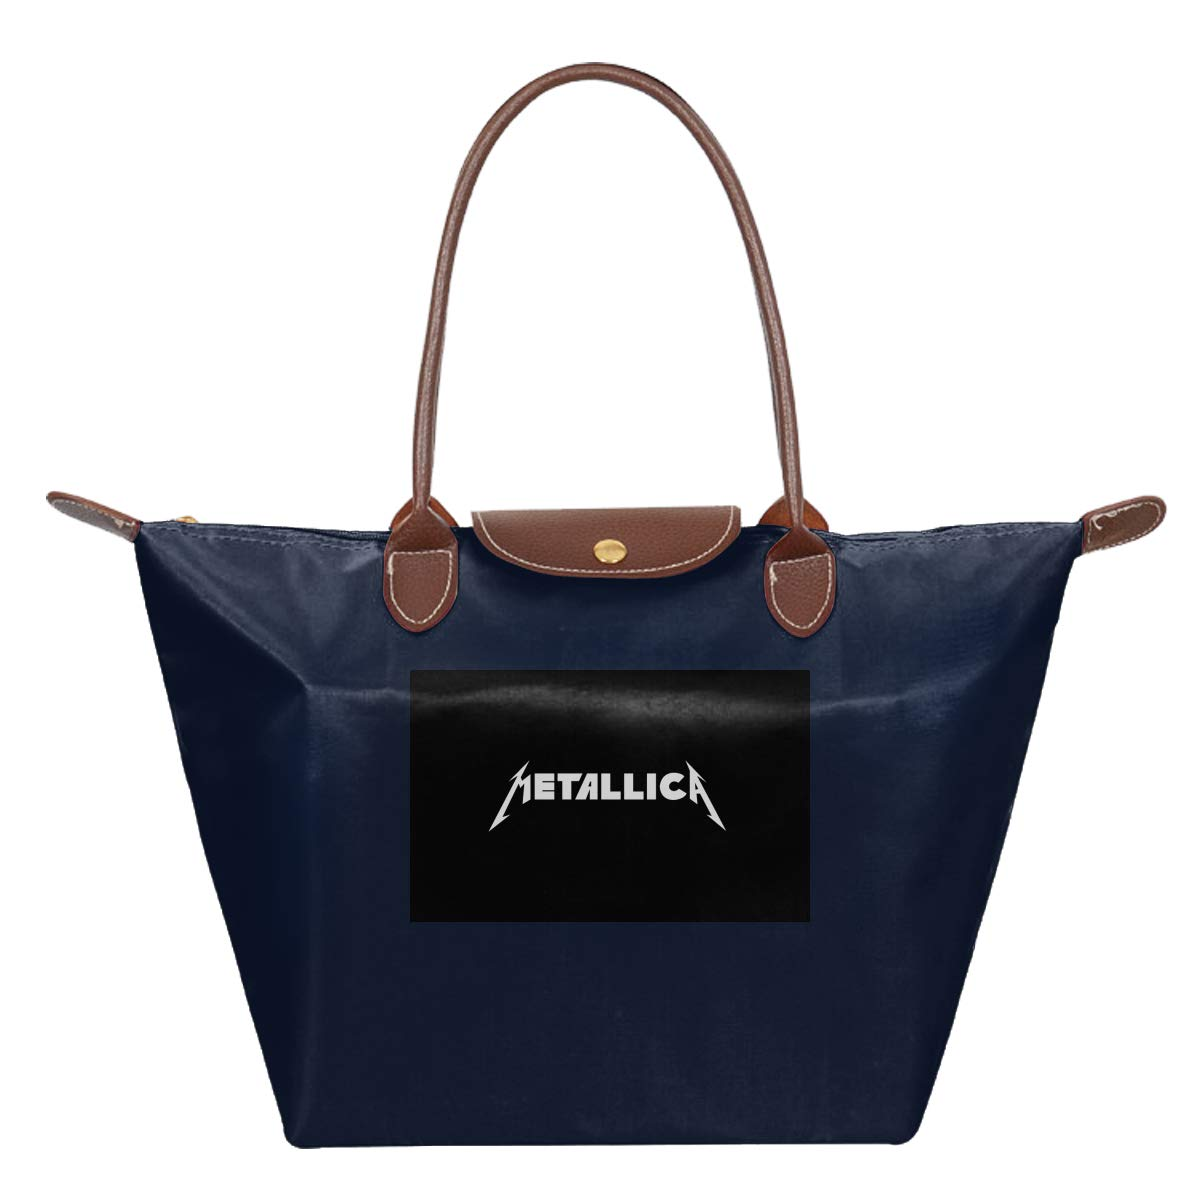 Metallica Waterproof Leather Folded Messenger Nylon Bag Travel Tote Hopping Folding School Handbags